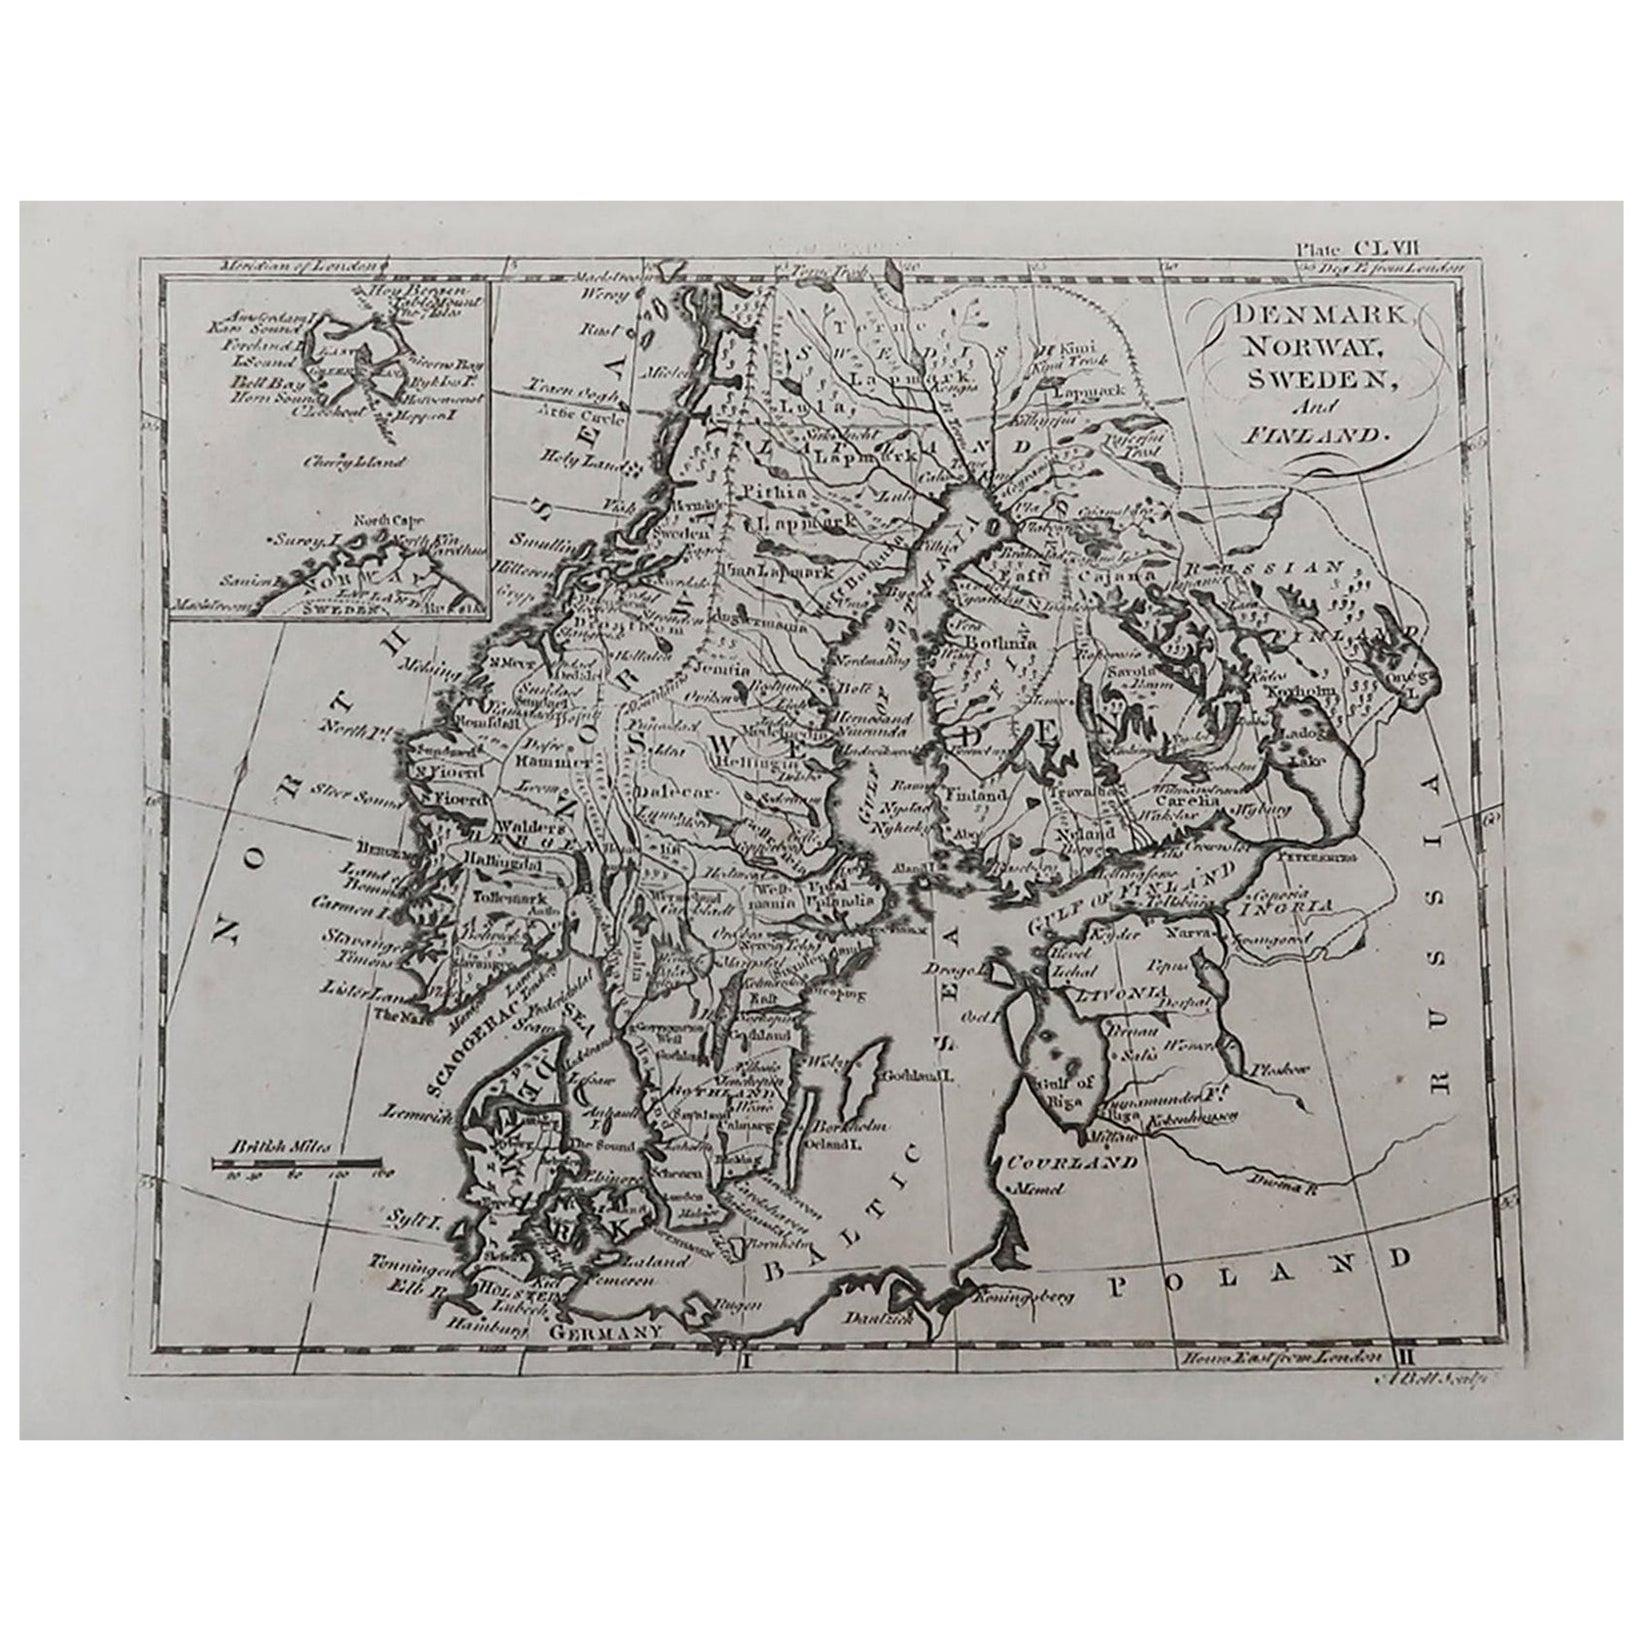 Original Antique Map of Sweden, Norway, Denmark and Finland, circa 1790